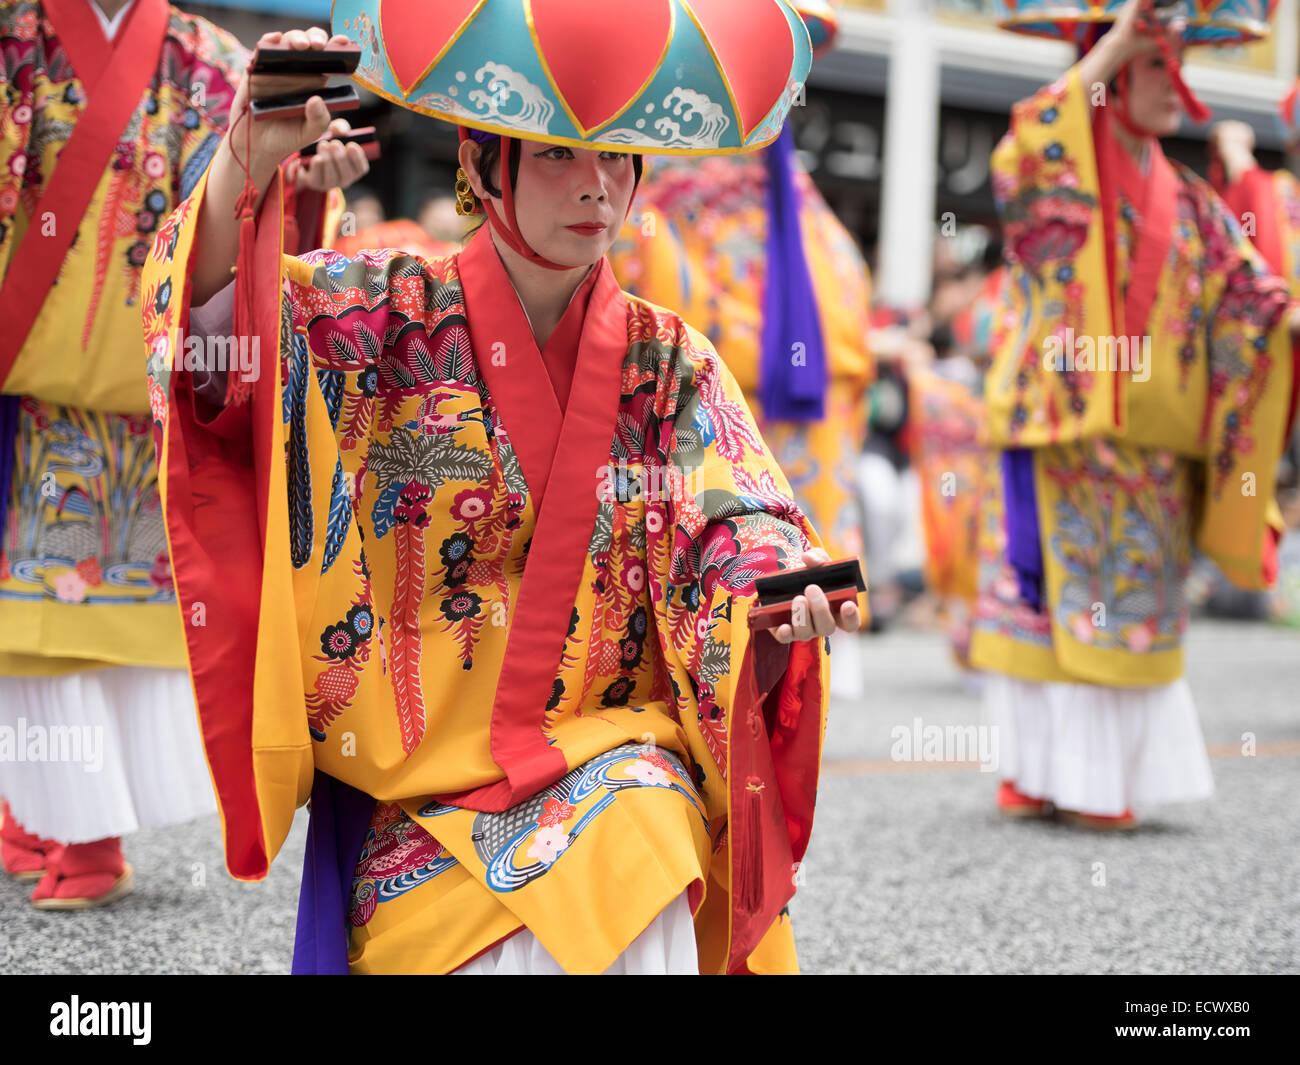 Parade of traditional ryukyu dancers wearing bingata kimonos and hanagasa hats. Kokusai-dori aka International Street, - Stock Image